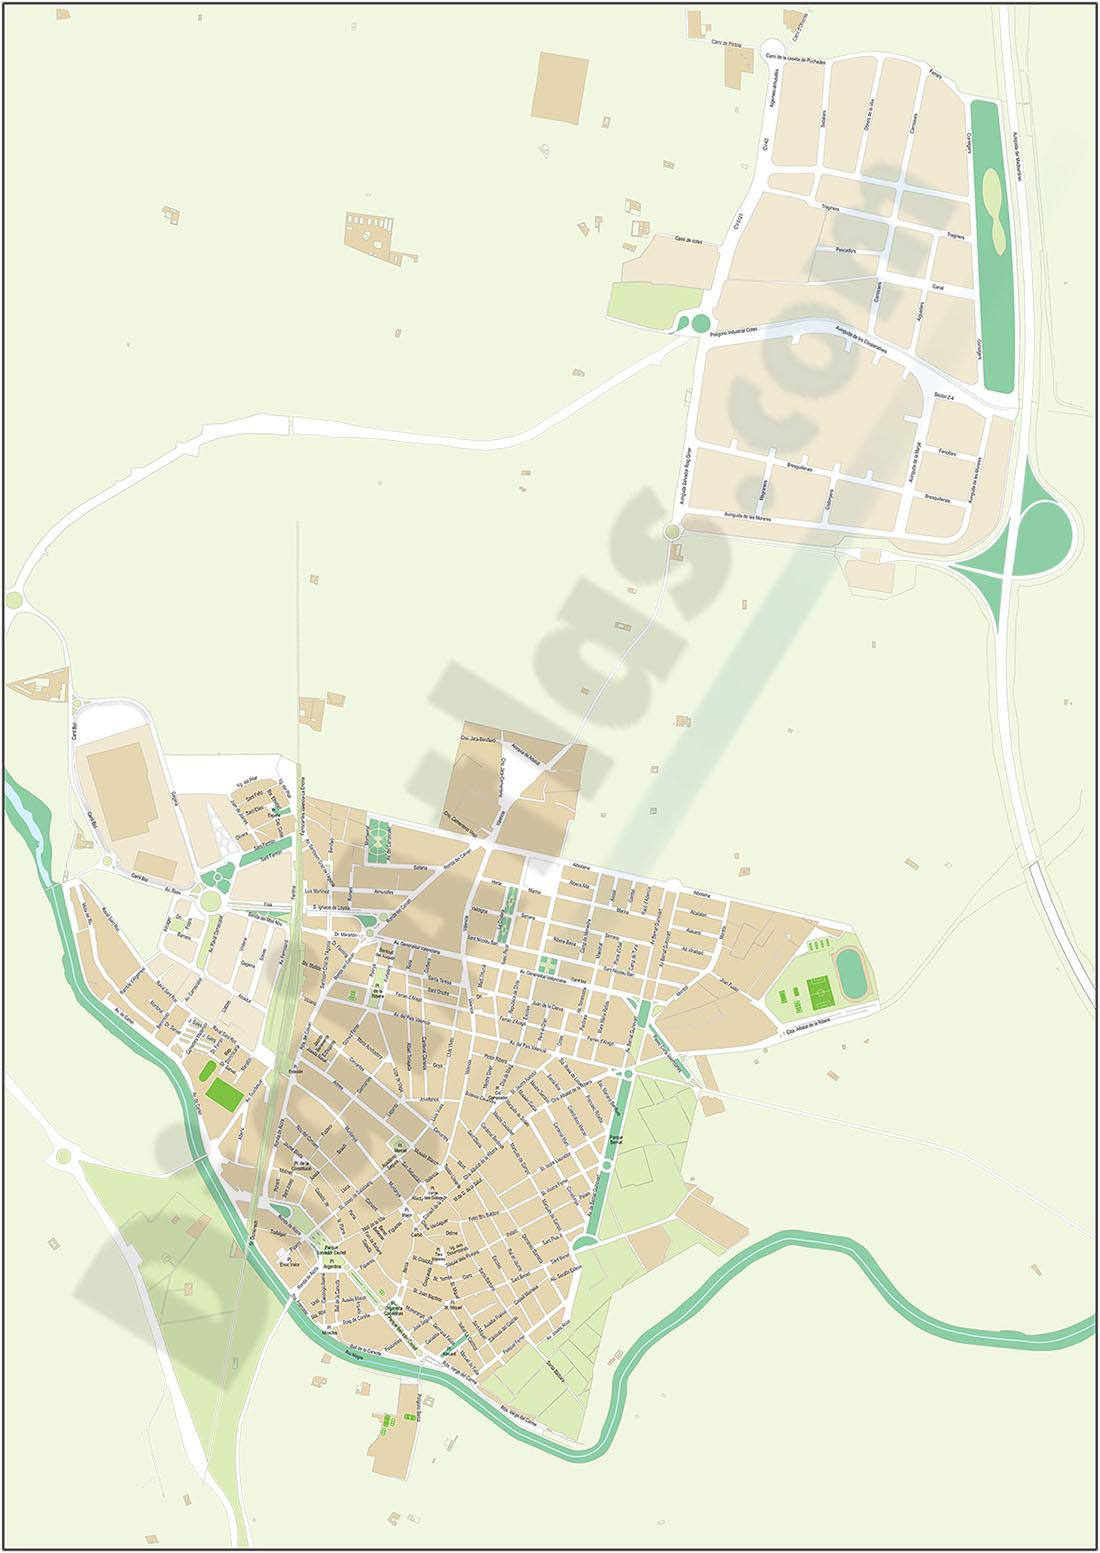 Algemesi - city map